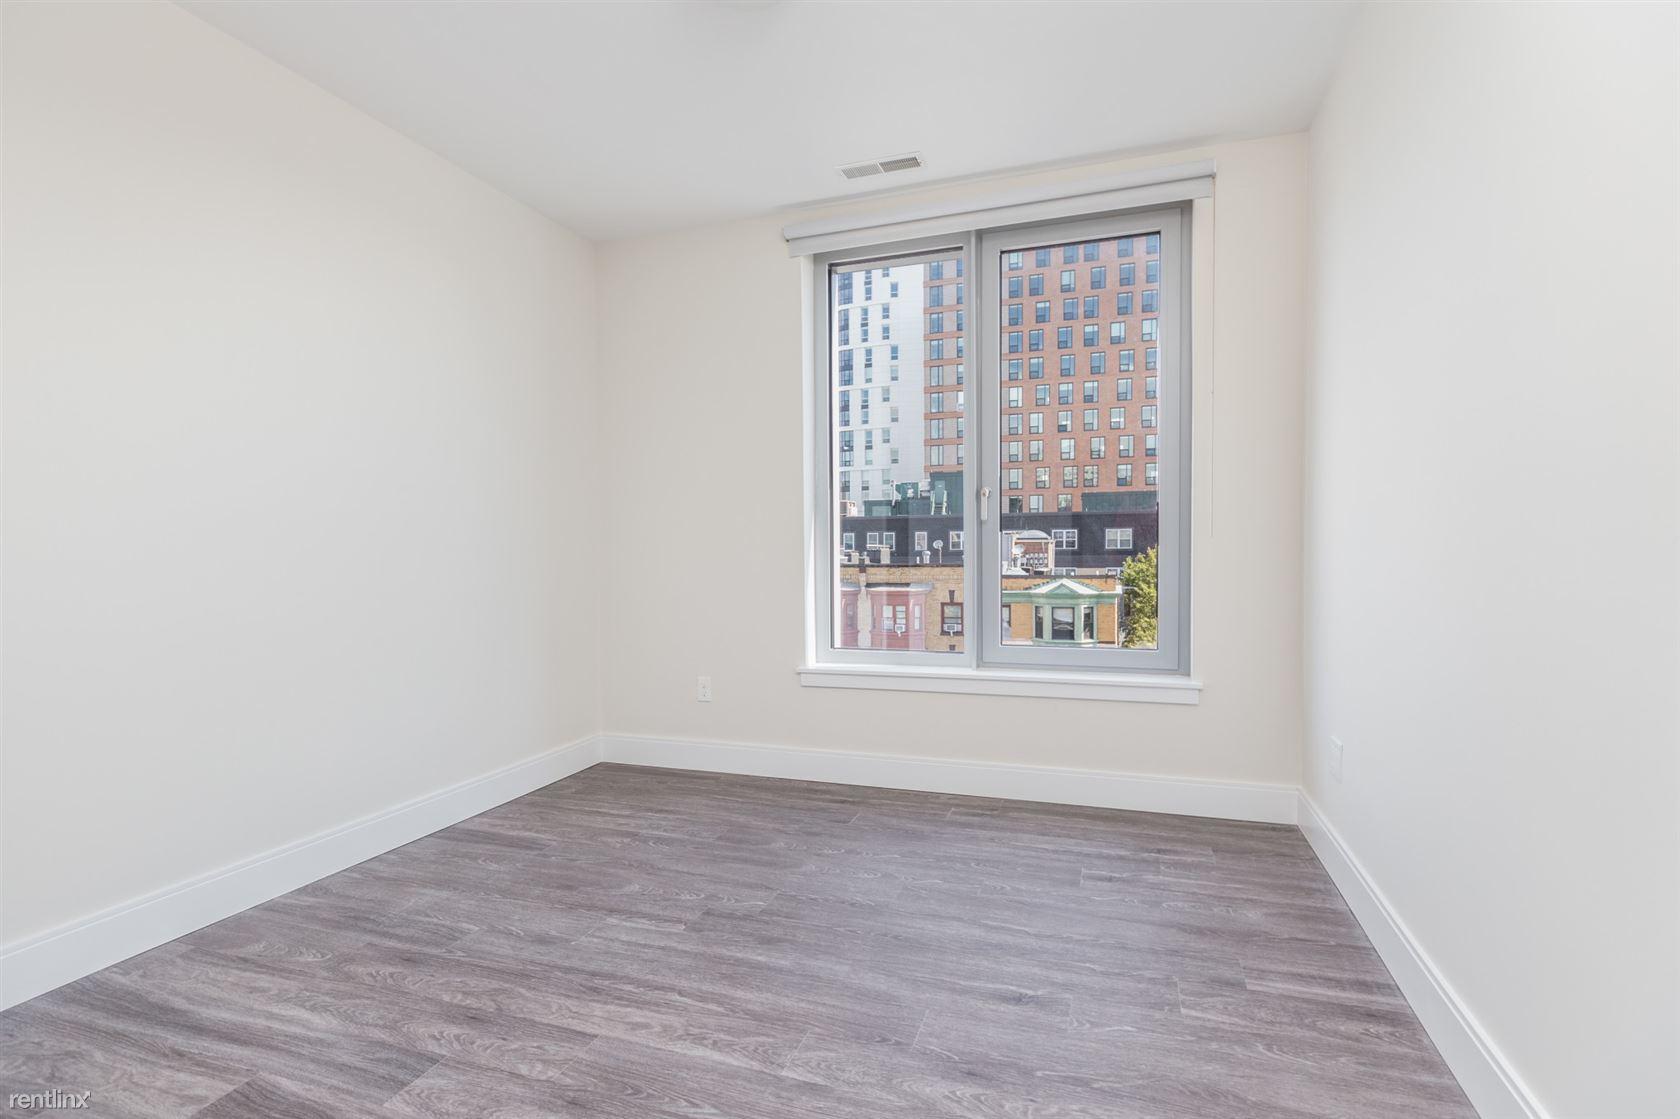 1065 Tremont St, Boston, MA - $6,000